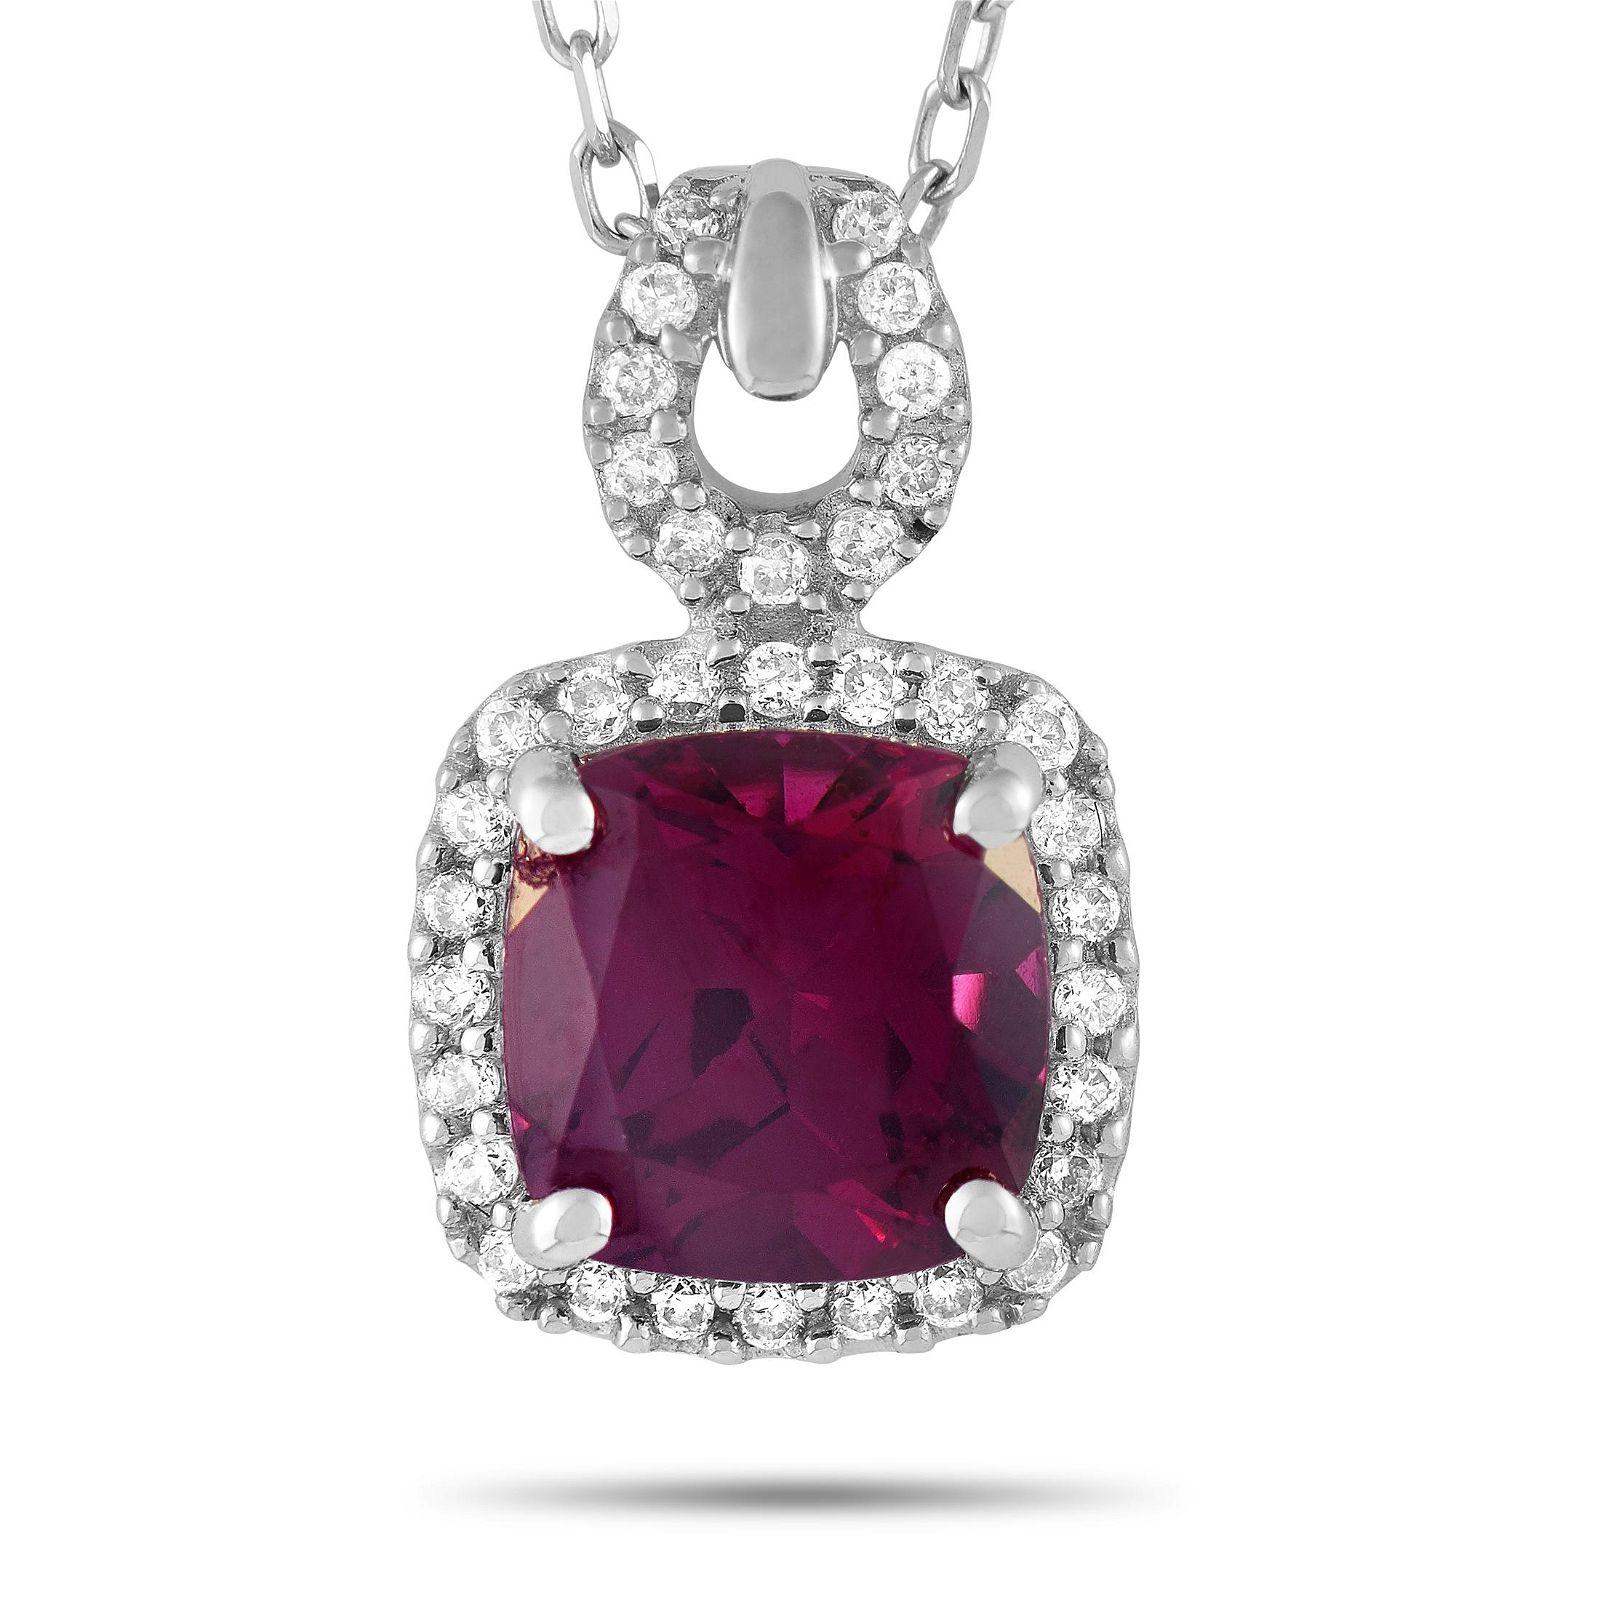 14K WG 0.12 ct Diamond / Rhodolite Garnet Pendant